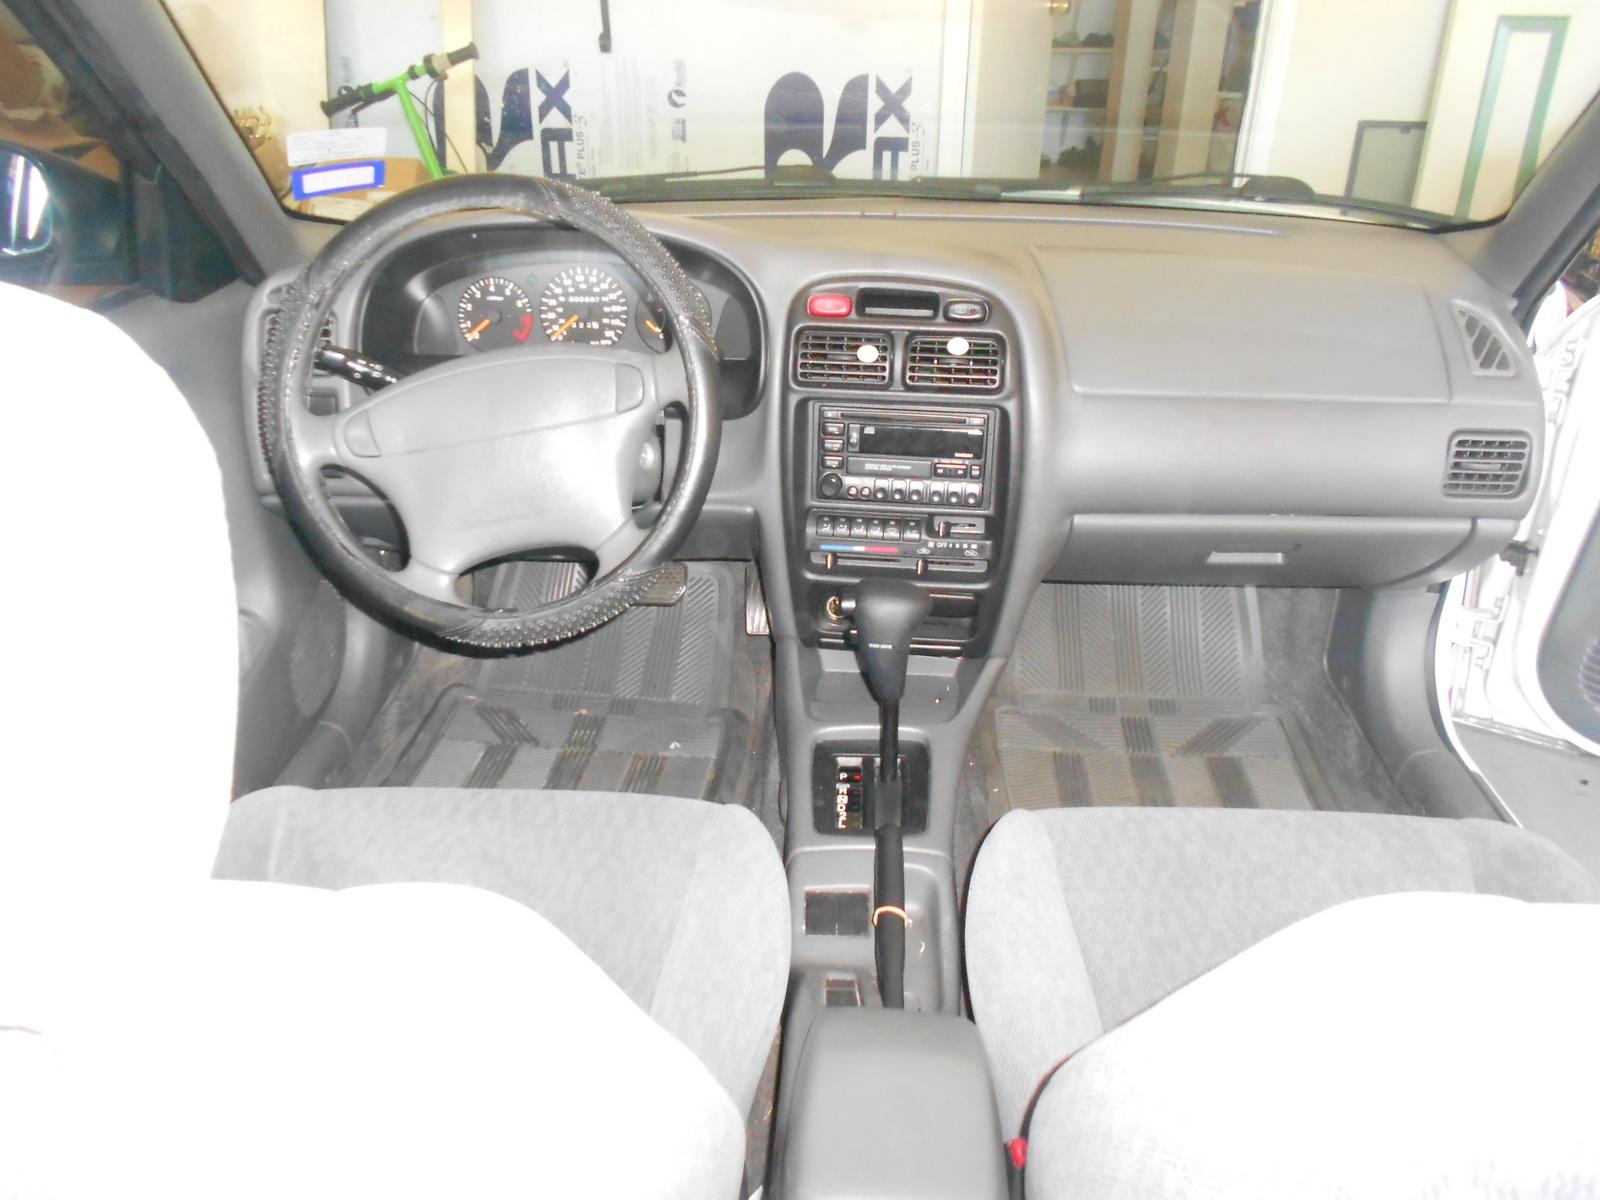 2002 Suzuki Esteem - Information and photos - ZombieDrive